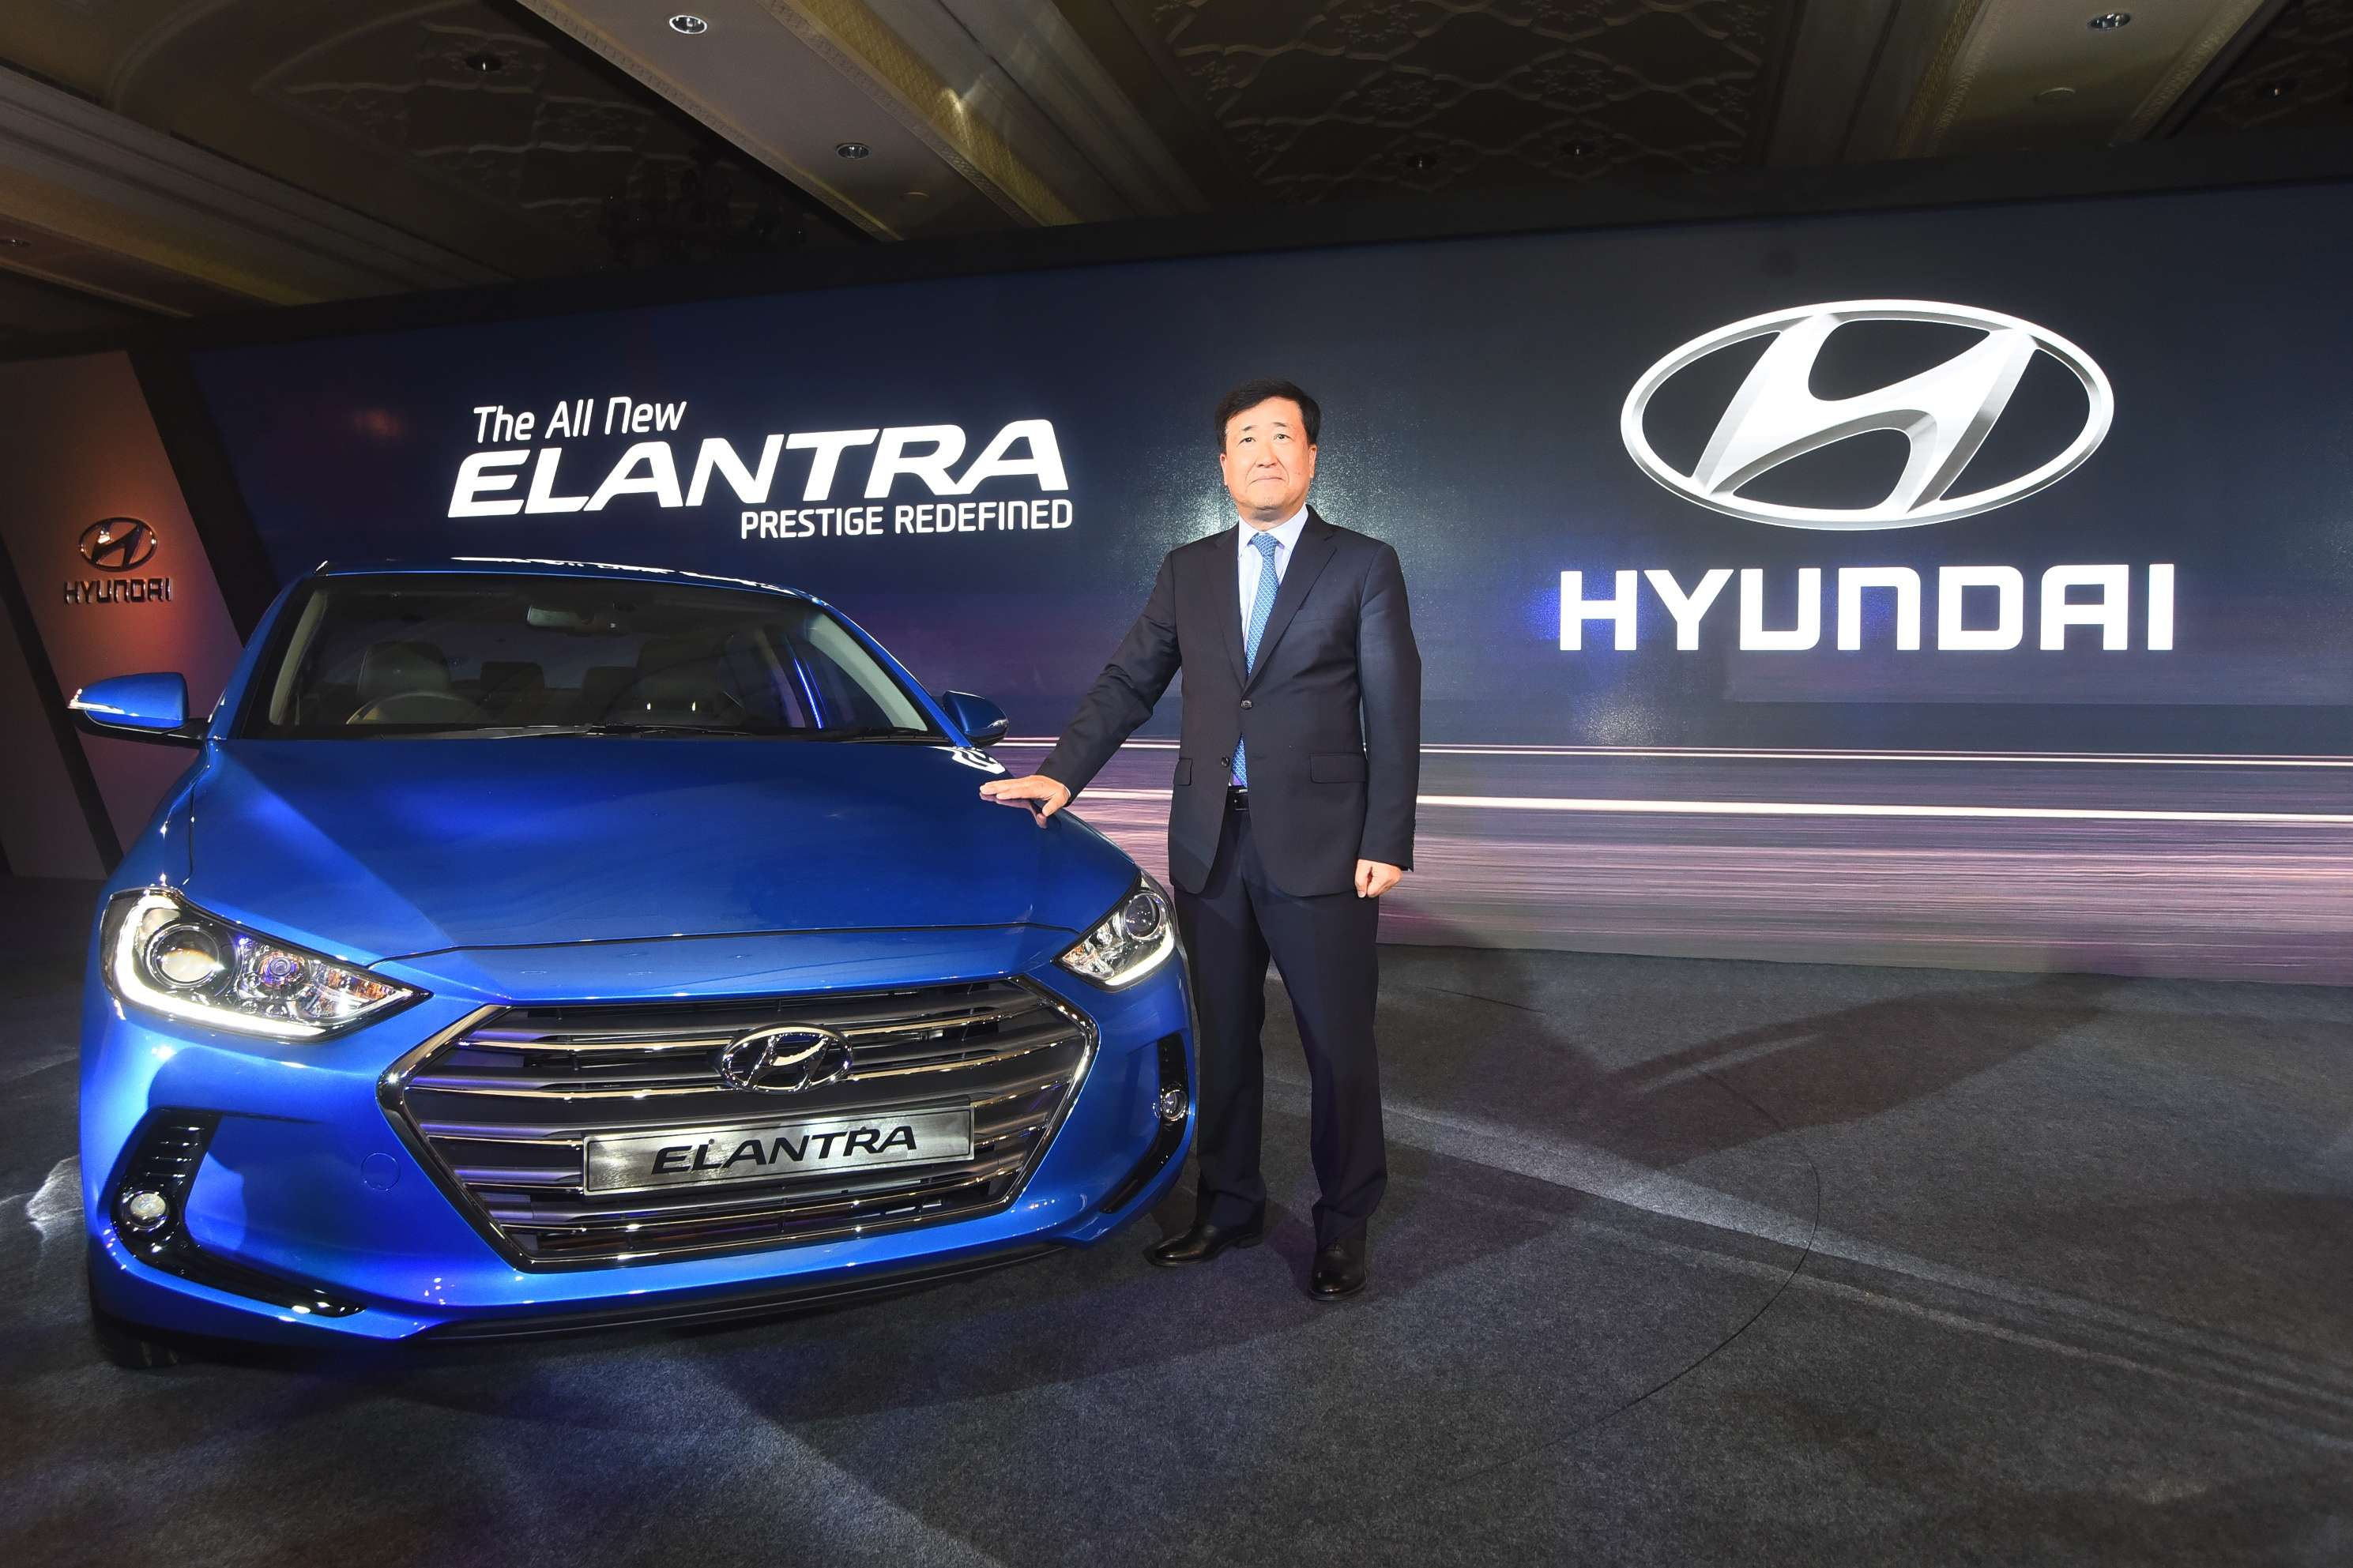 new car launches hyundaiAll new Hyundai Elantra receives 405 bookings within 8 days of